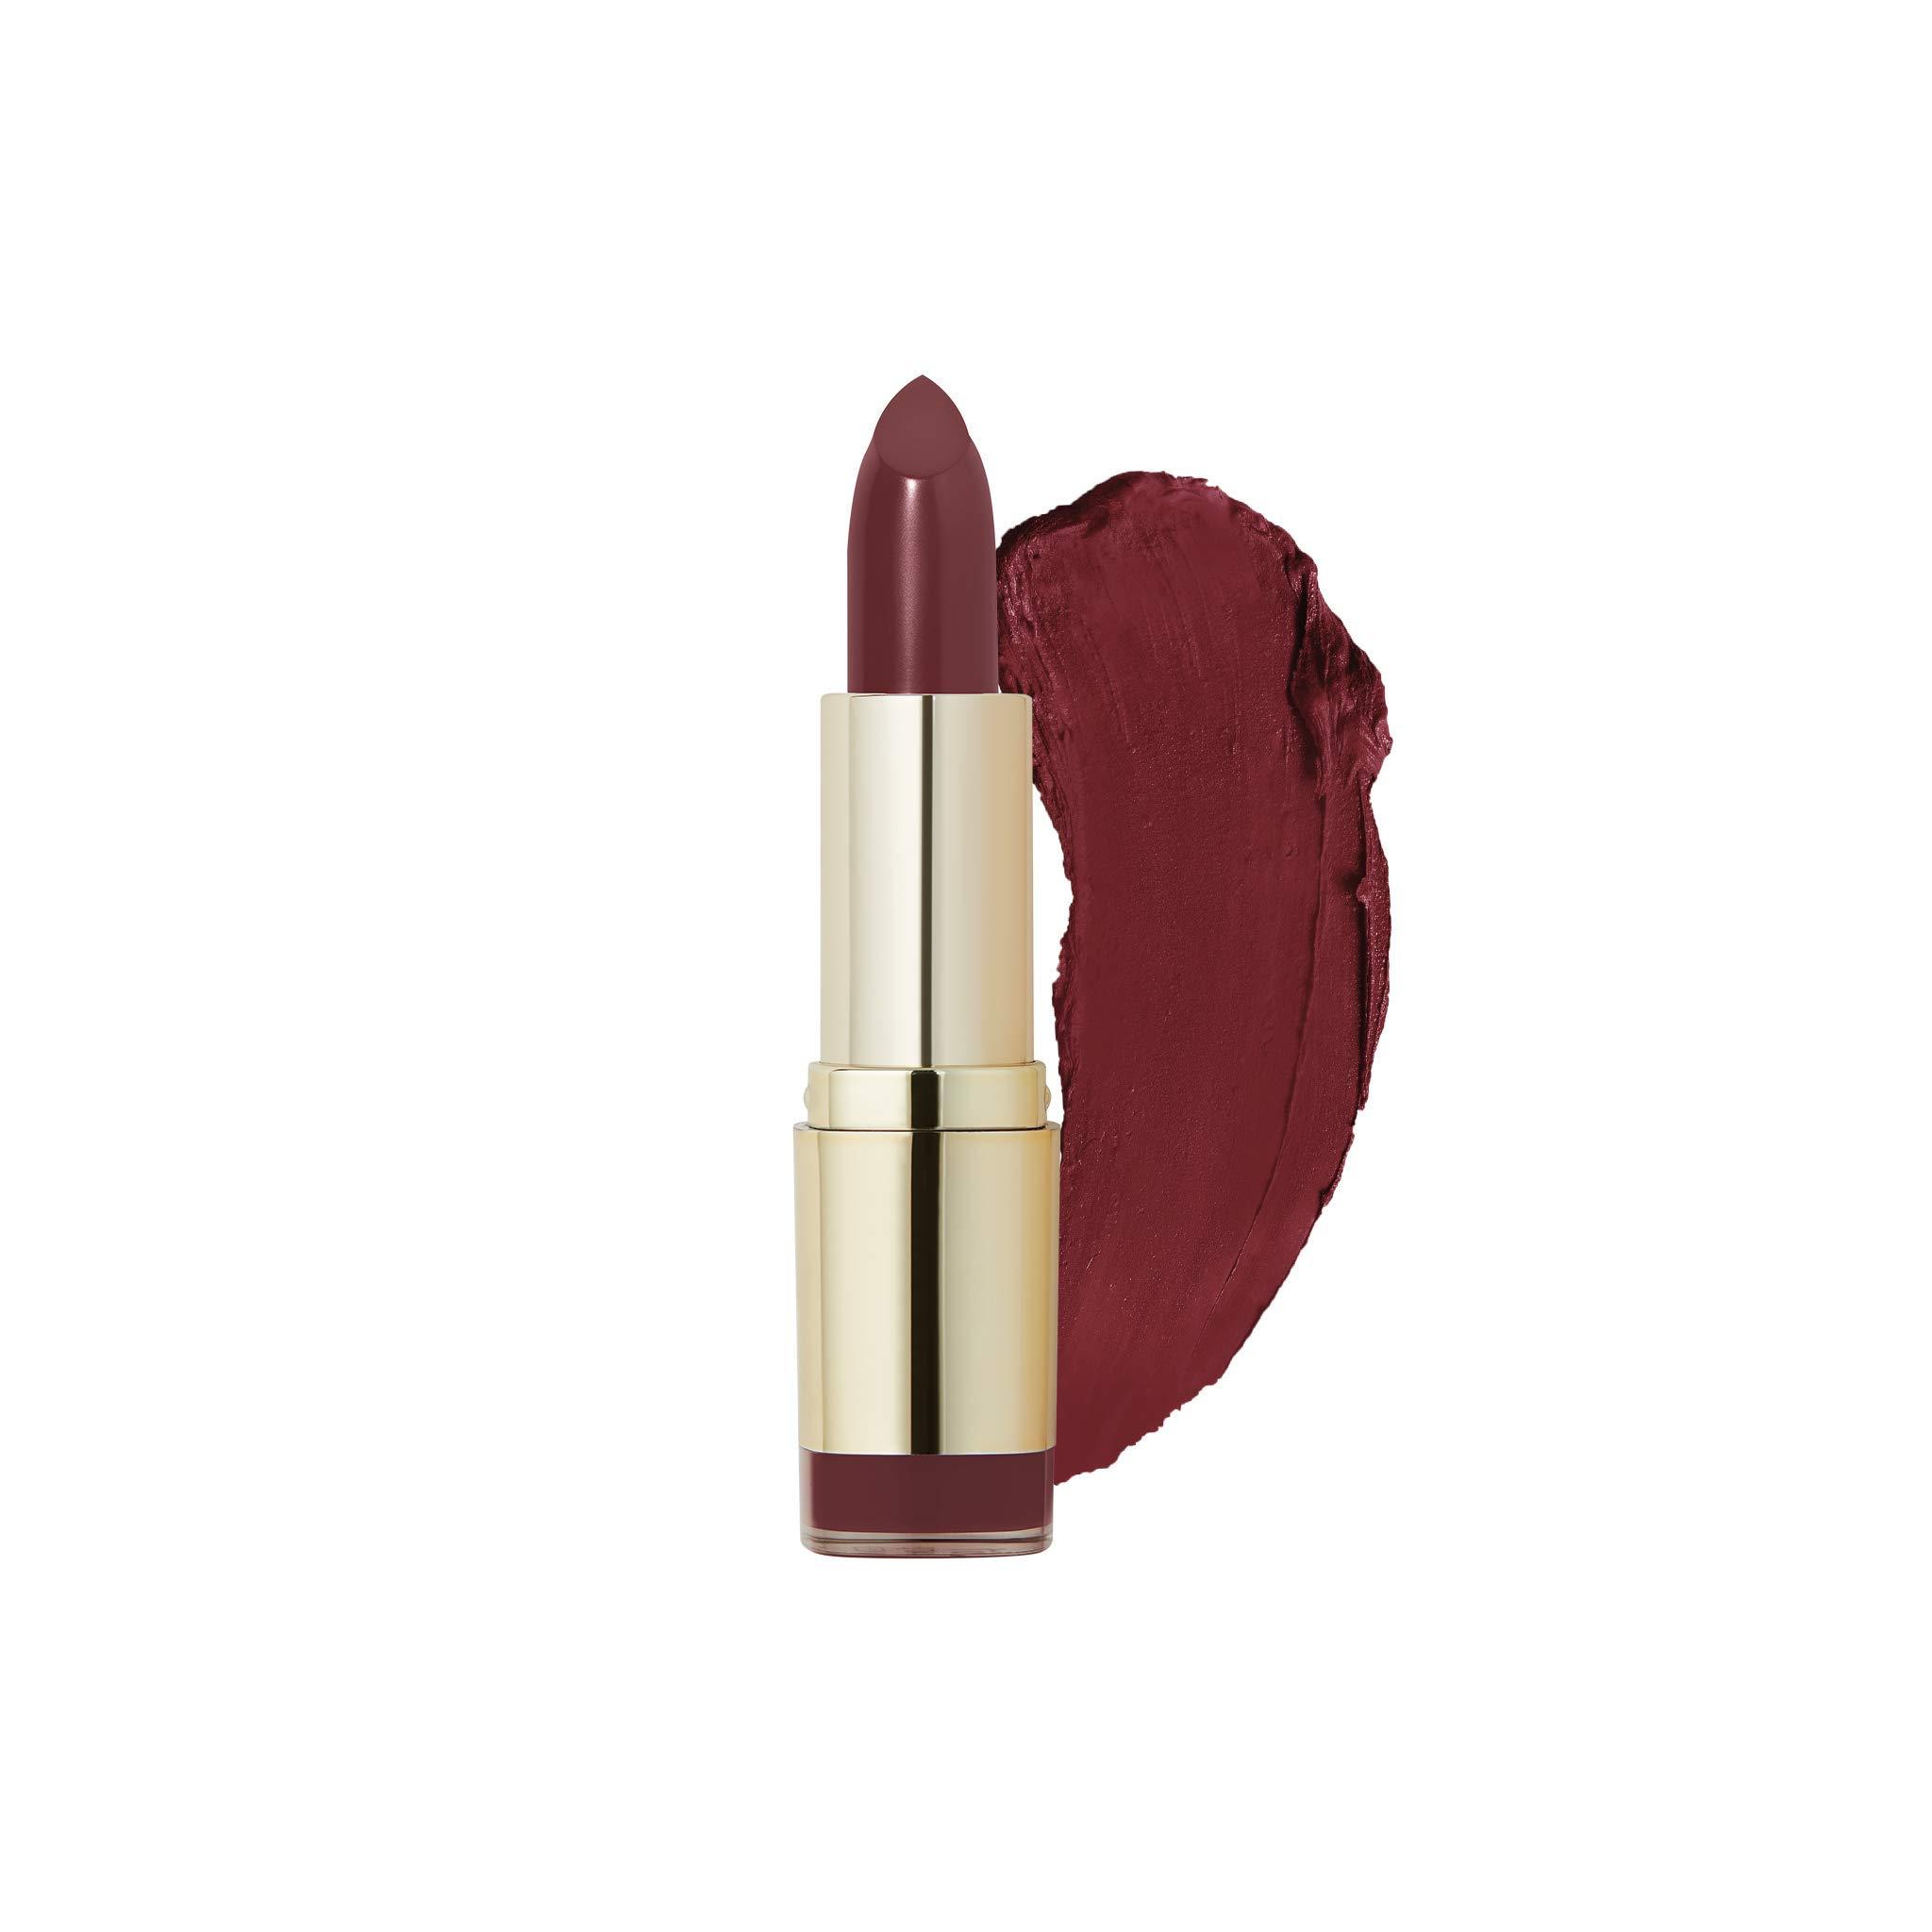 Milani Color Statement Matte Lipstick - Matte Drama (0.14 Ounce) Cruelty-Free Nourishing Lipstick with a Full Matte Finish